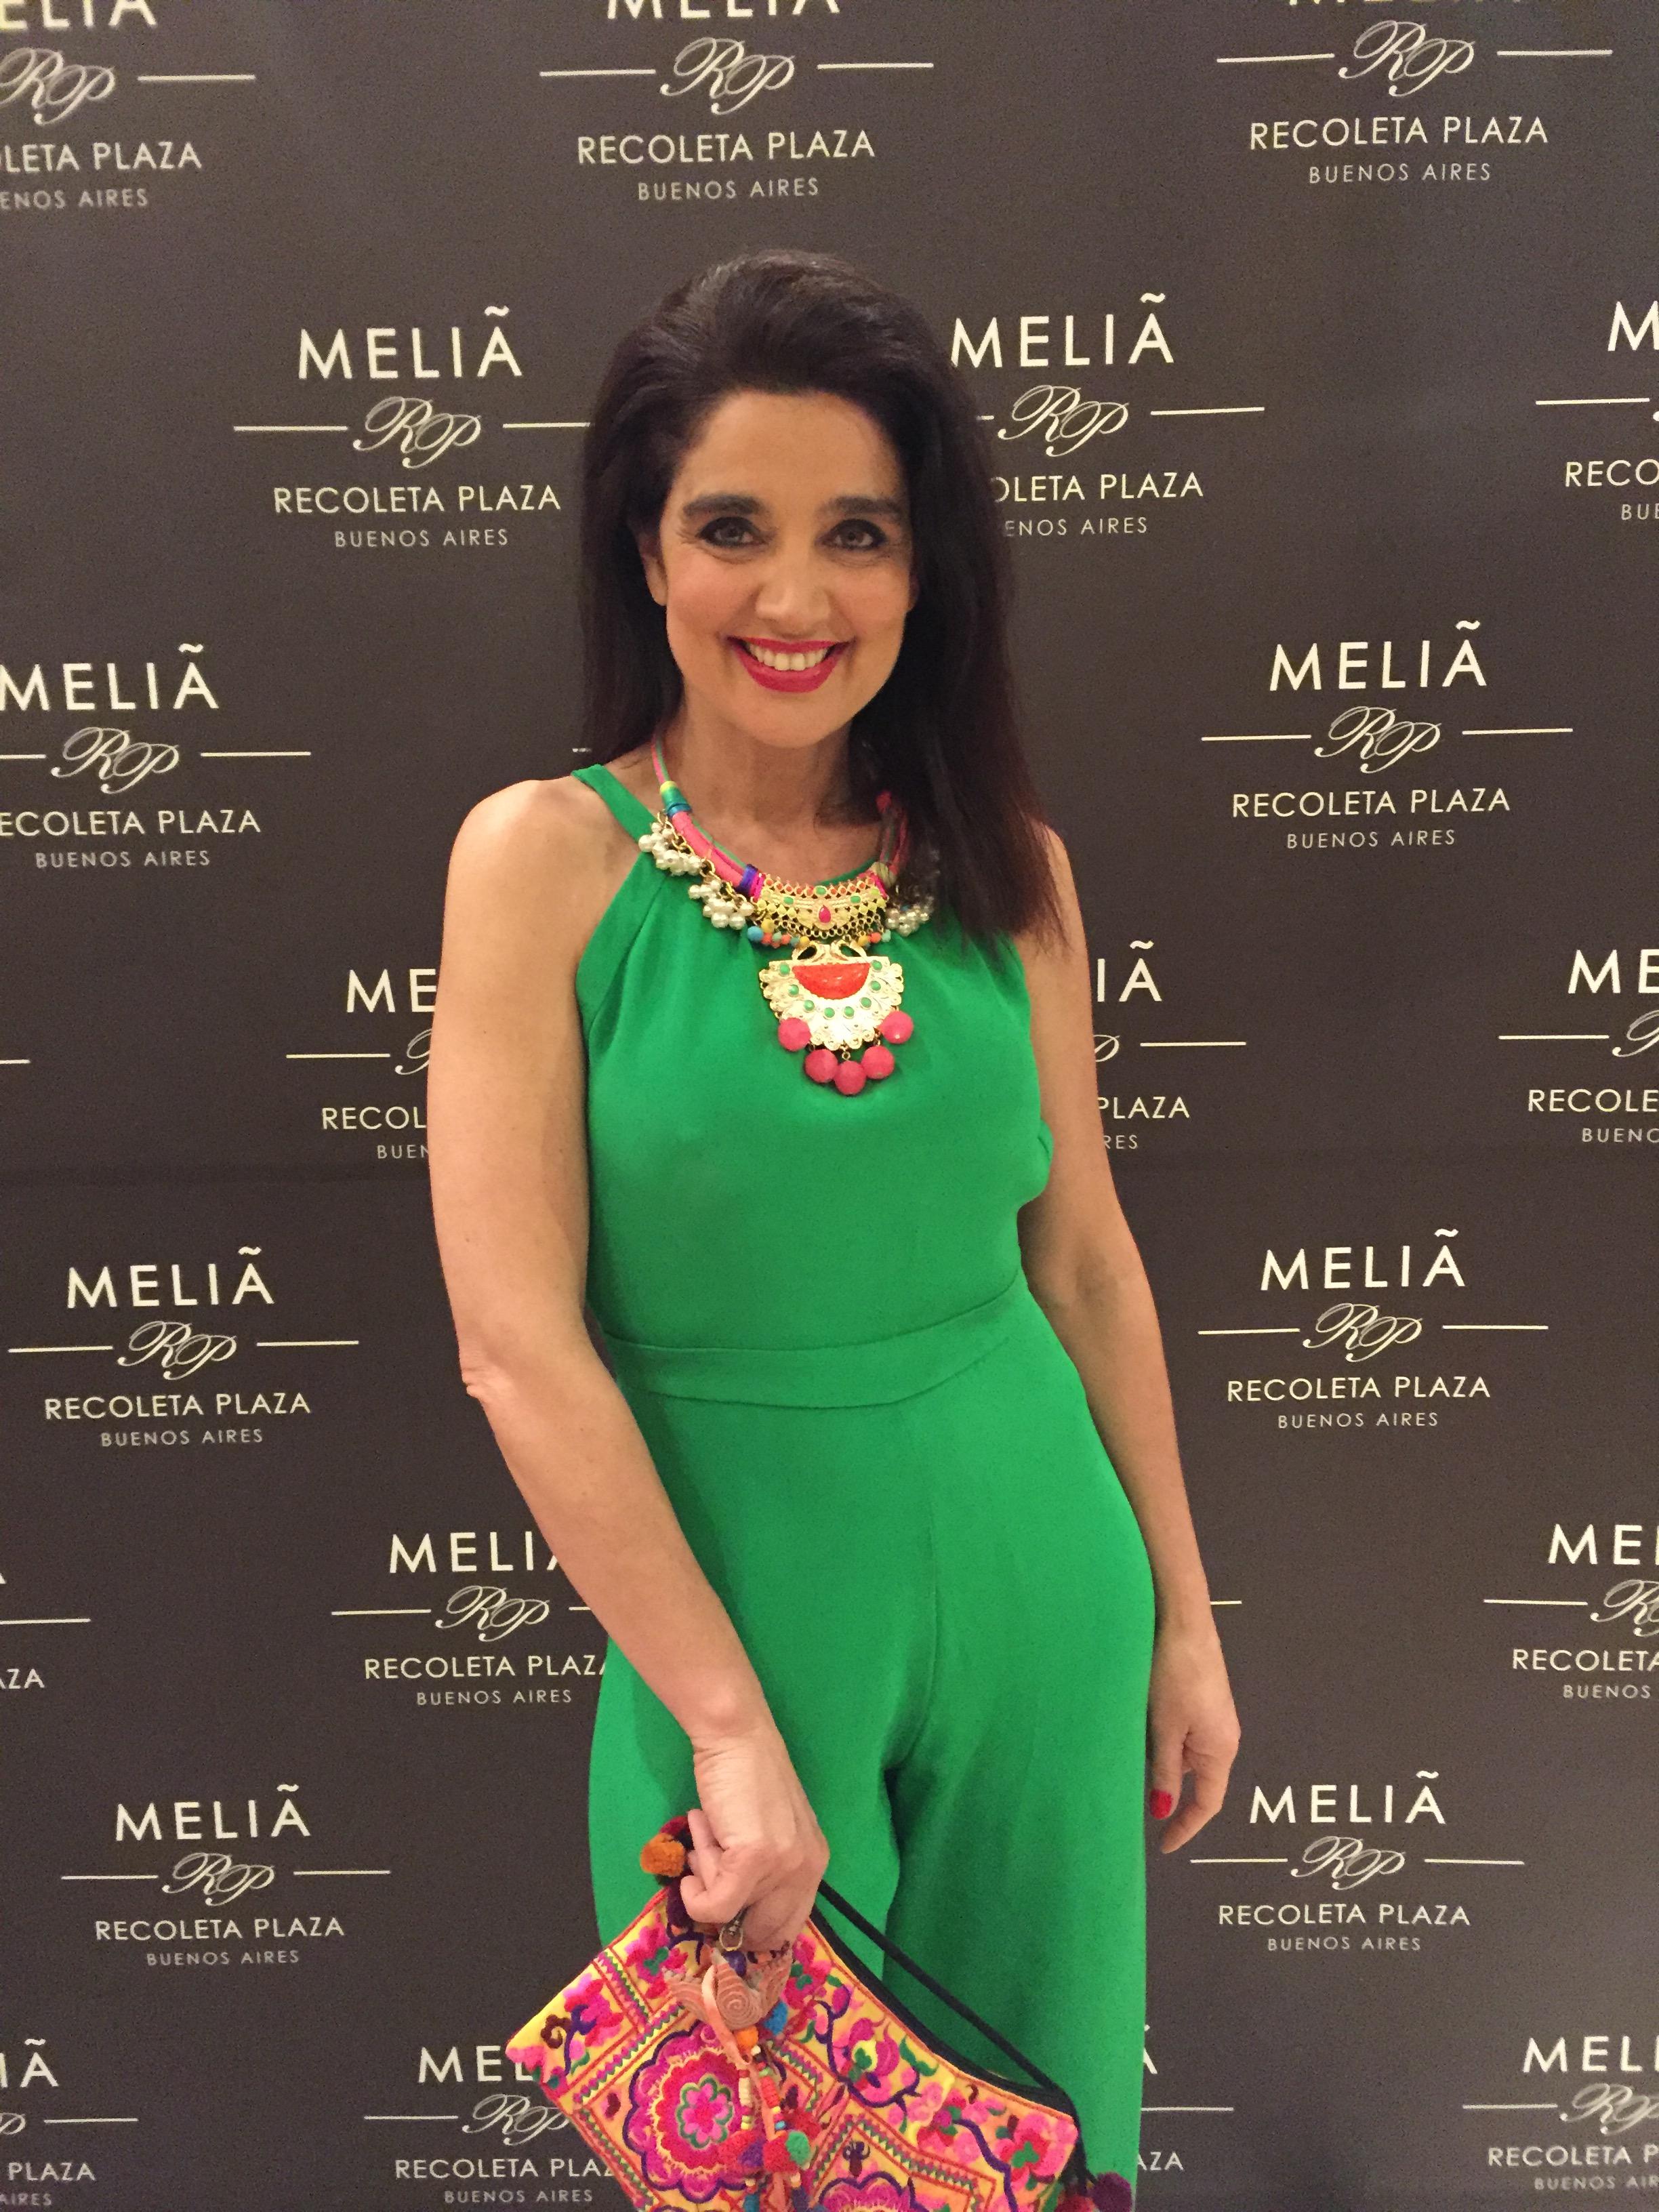 Verónica Varano